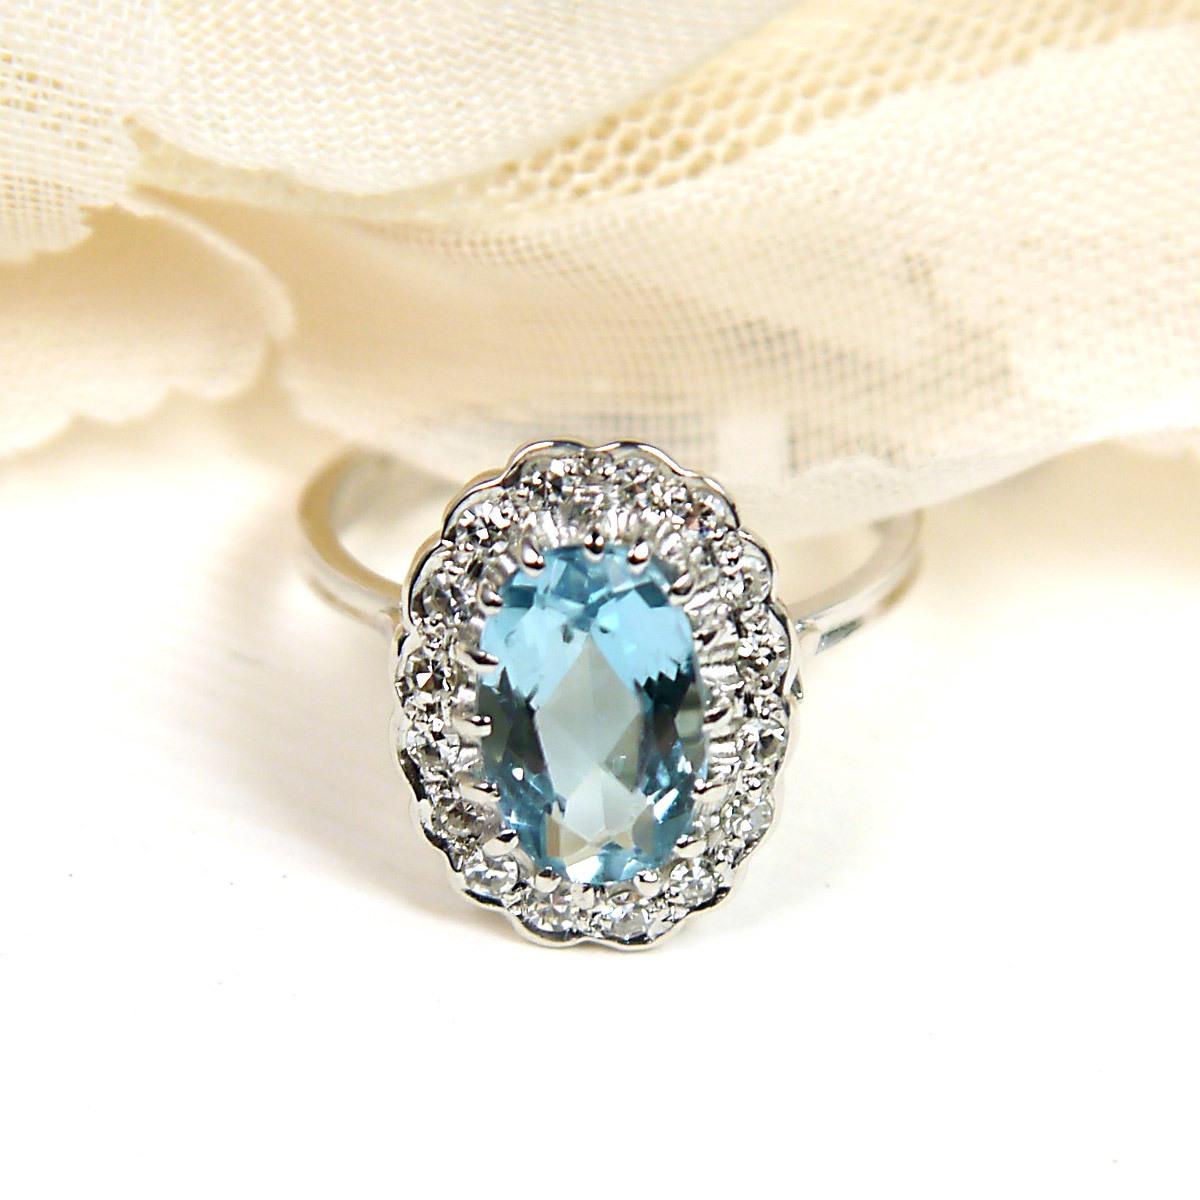 18k Aquamarine Ring with Diamonds